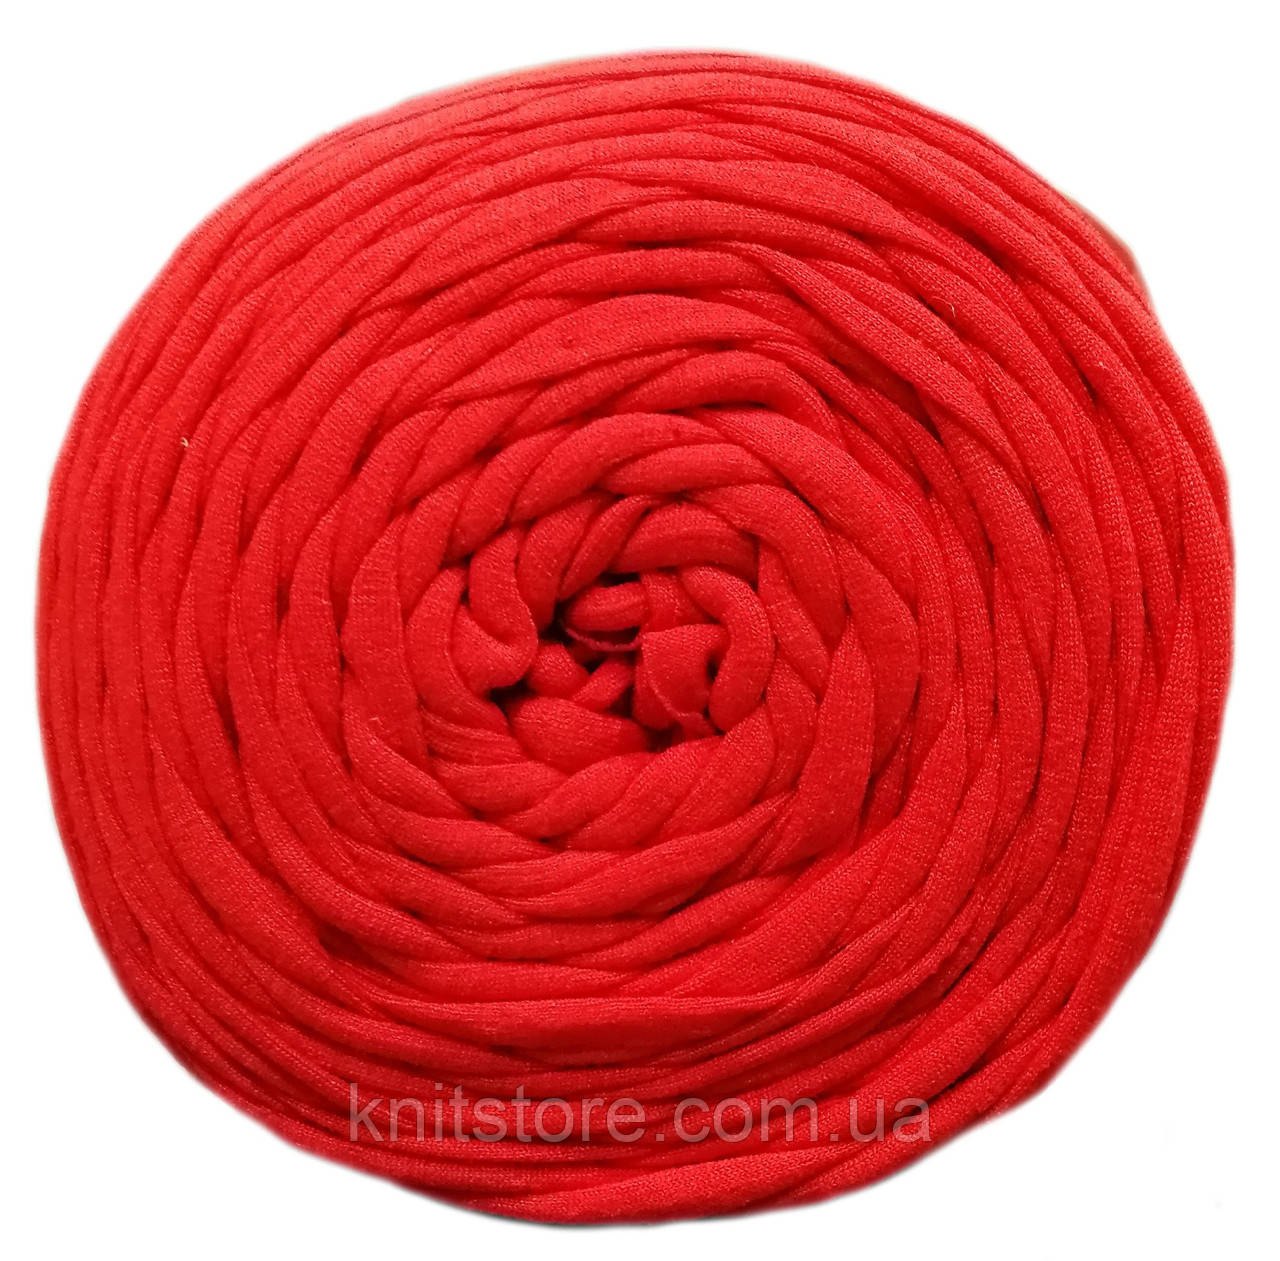 Трикотажная пряжа Therapy T-shirt Yarn L-Size Красный